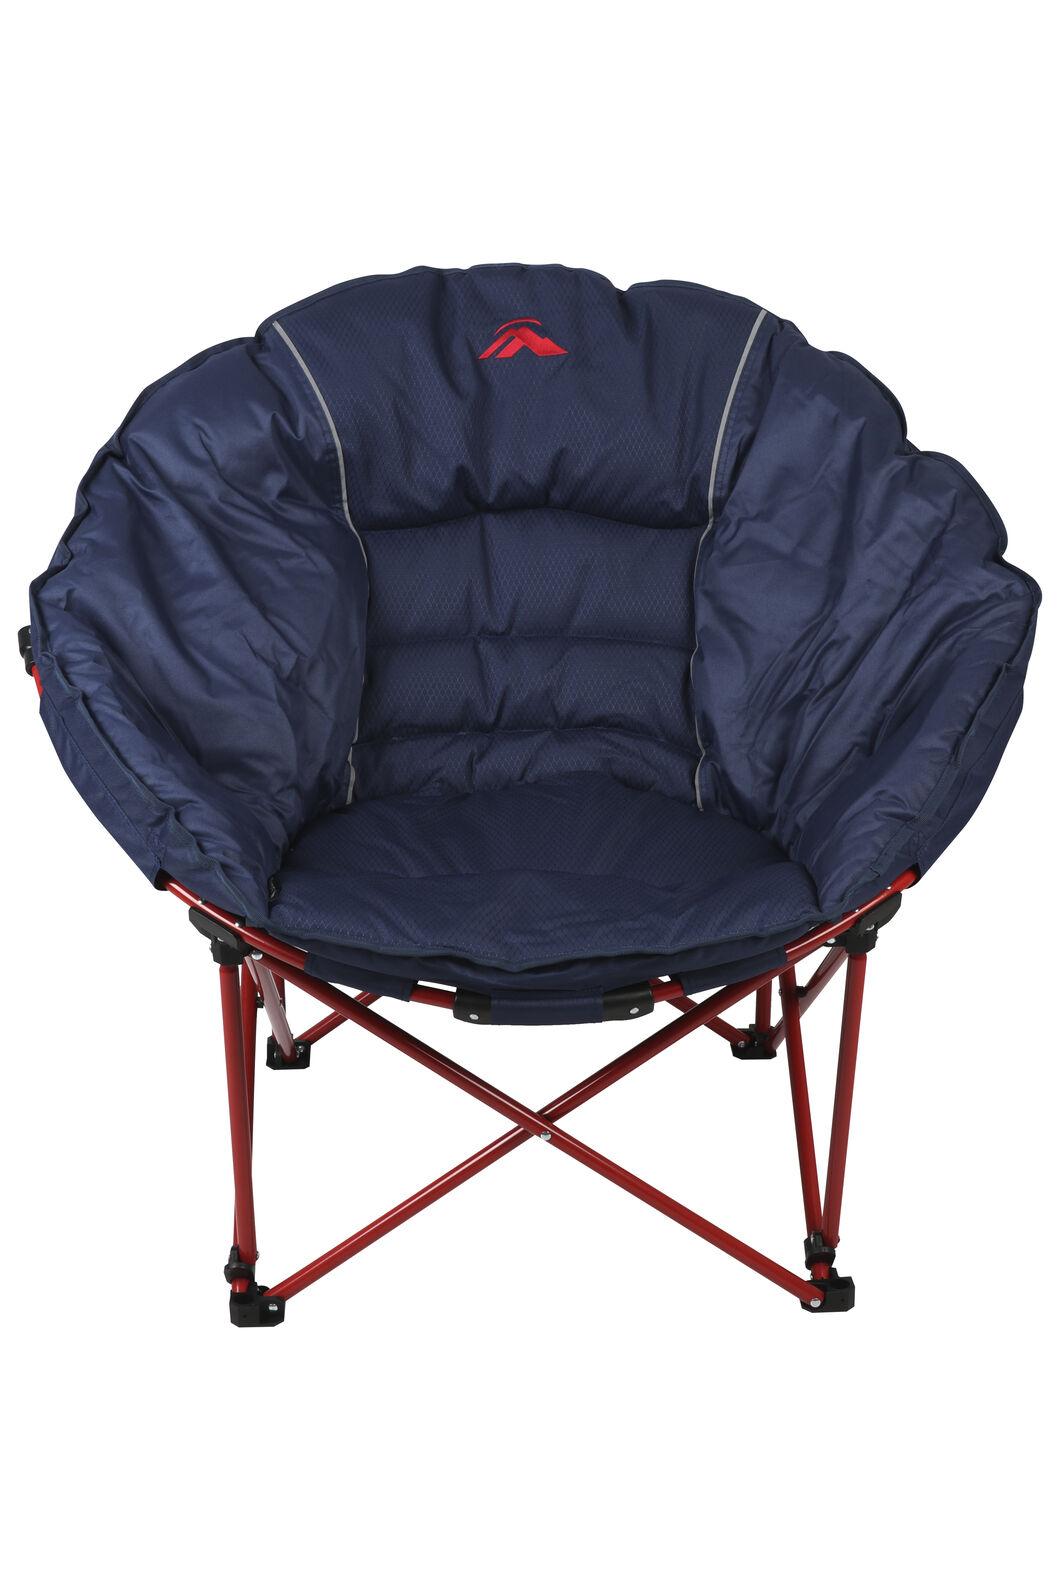 Macpac Moon Quad Folding Chair, Navy/Red, hi-res